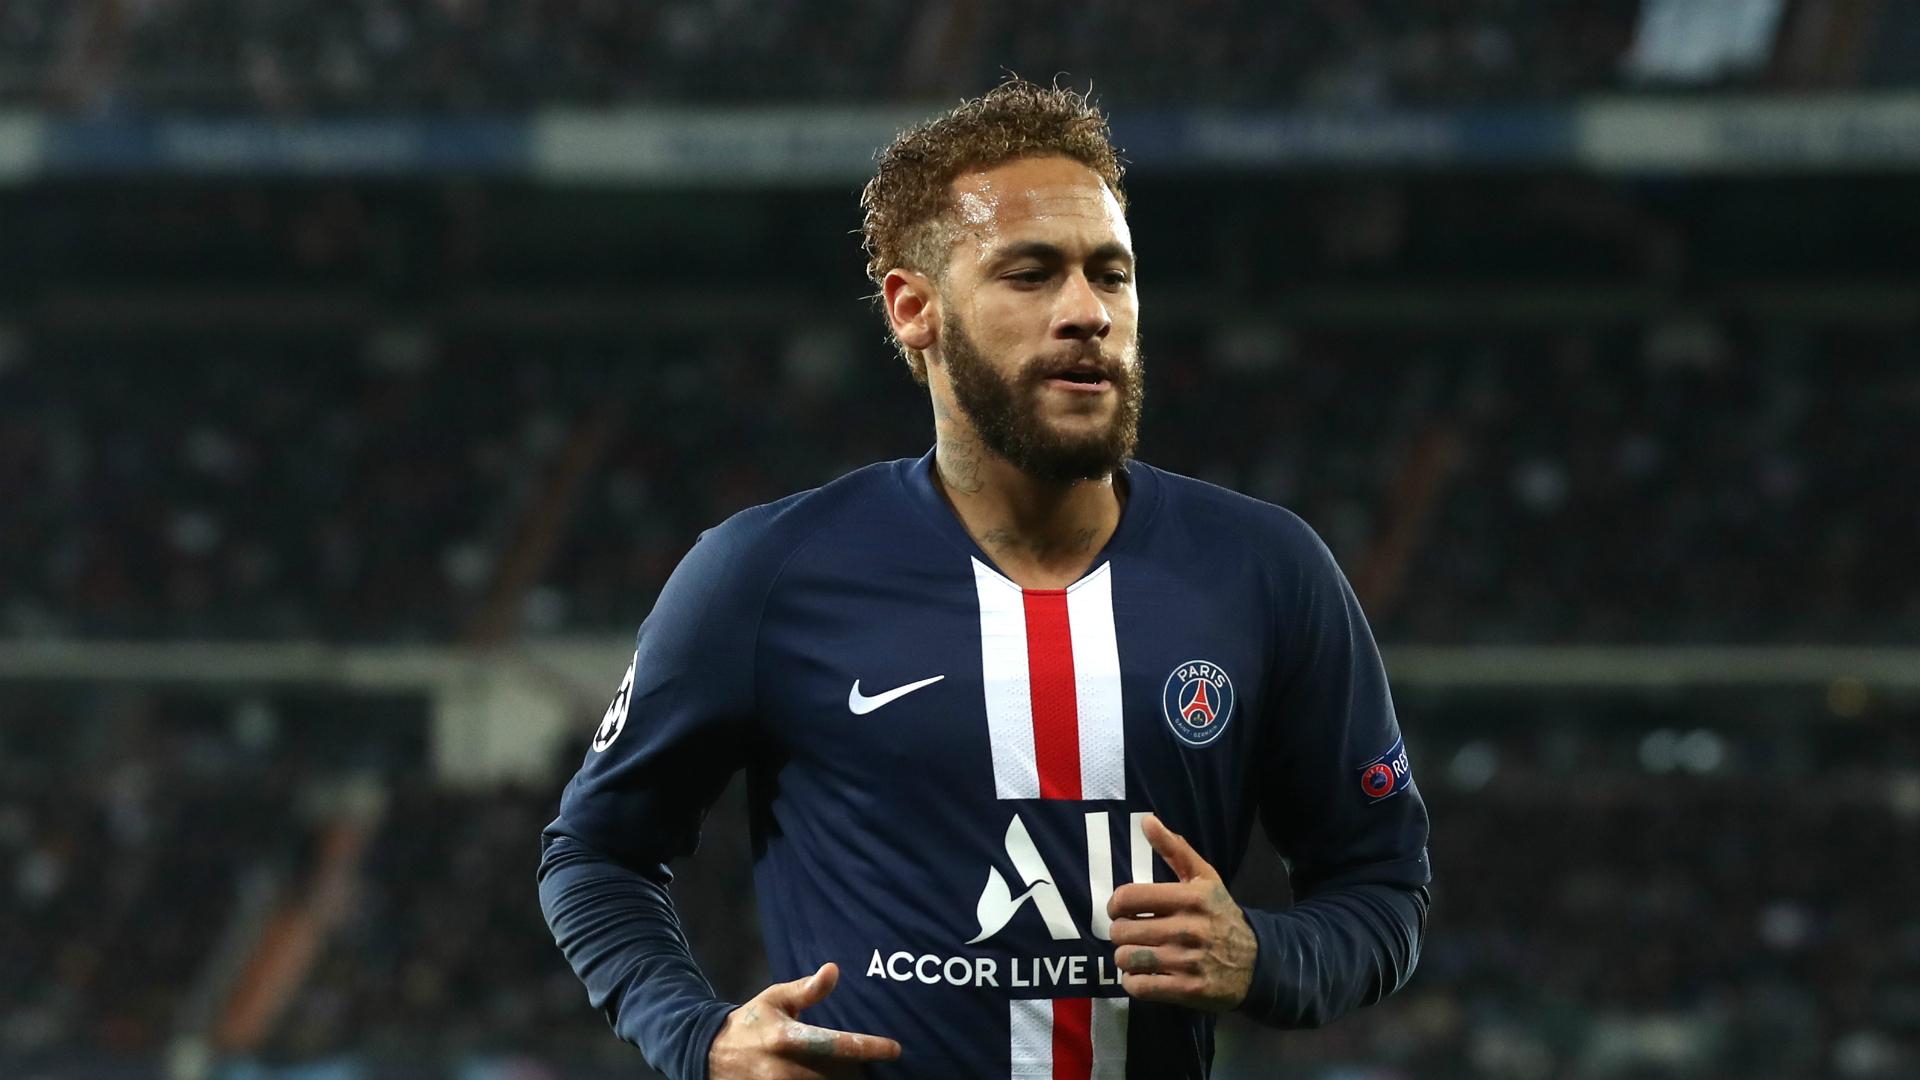 Psg To Make Neymar Decision On Sunday Says Tuchel